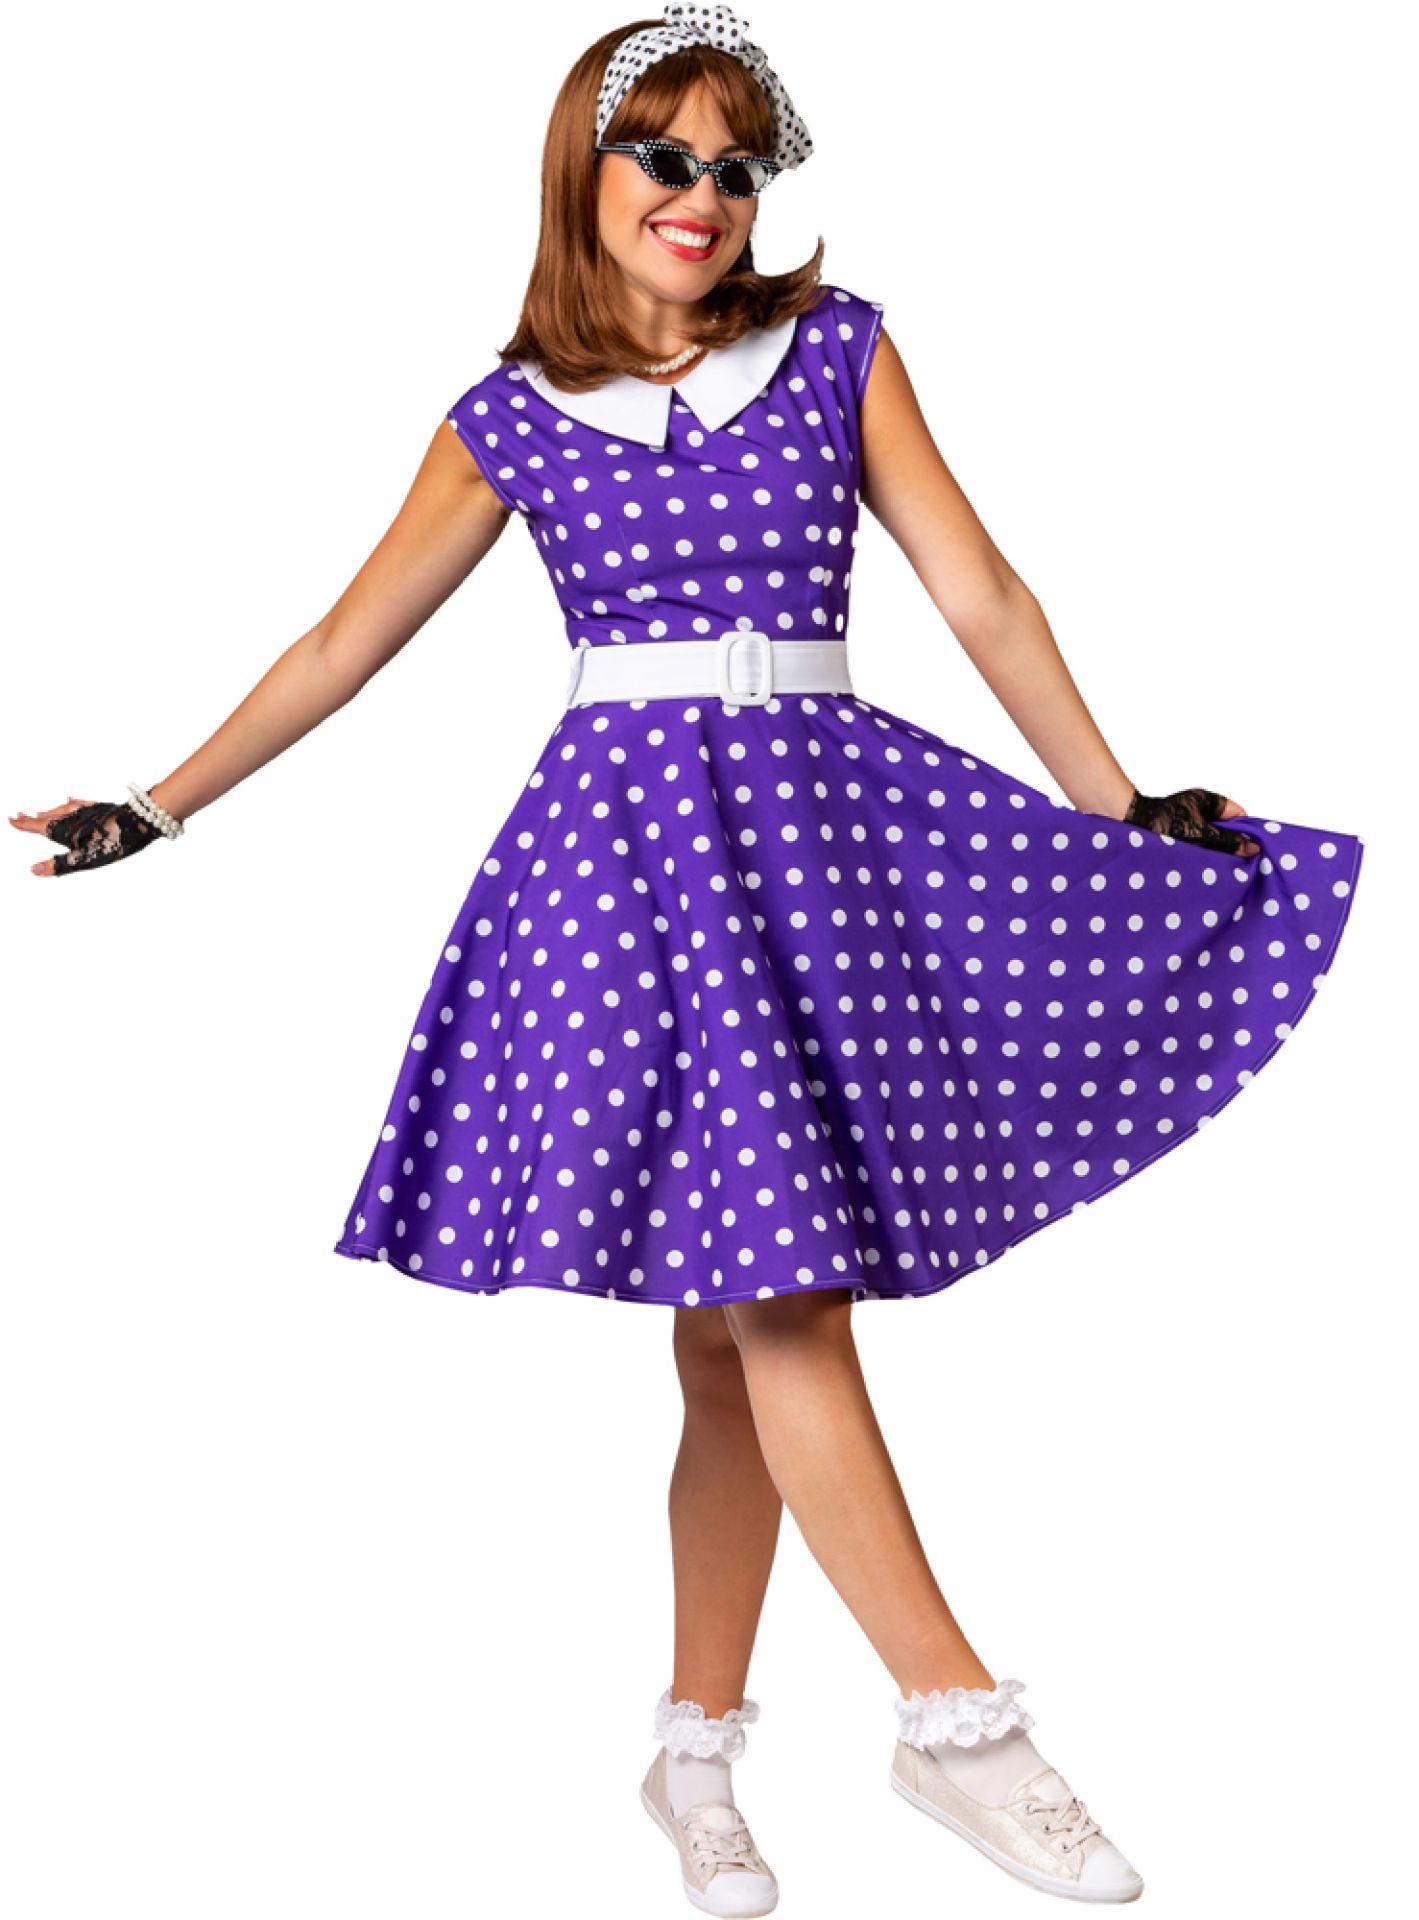 Kostüm Rock and Roll Girl Gr. 44, lila/weiß, (Kleid mit ...